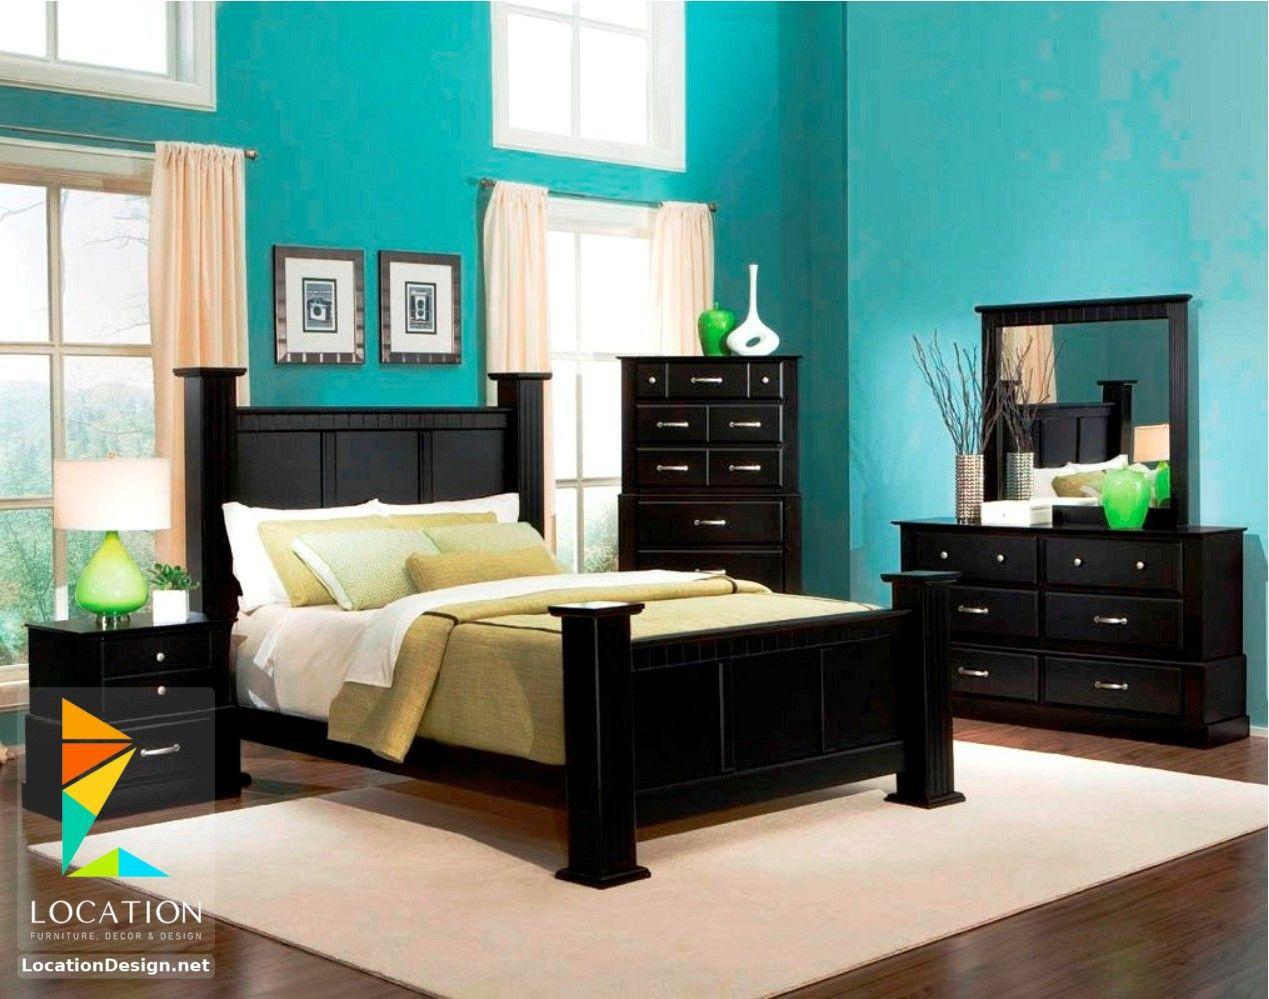 ديكورات غرف نوم صغيرة وبسيطة لوكشين ديزين نت Black Bedroom Furniture Set Bedroom Paint Colors Master Black Bedroom Furniture